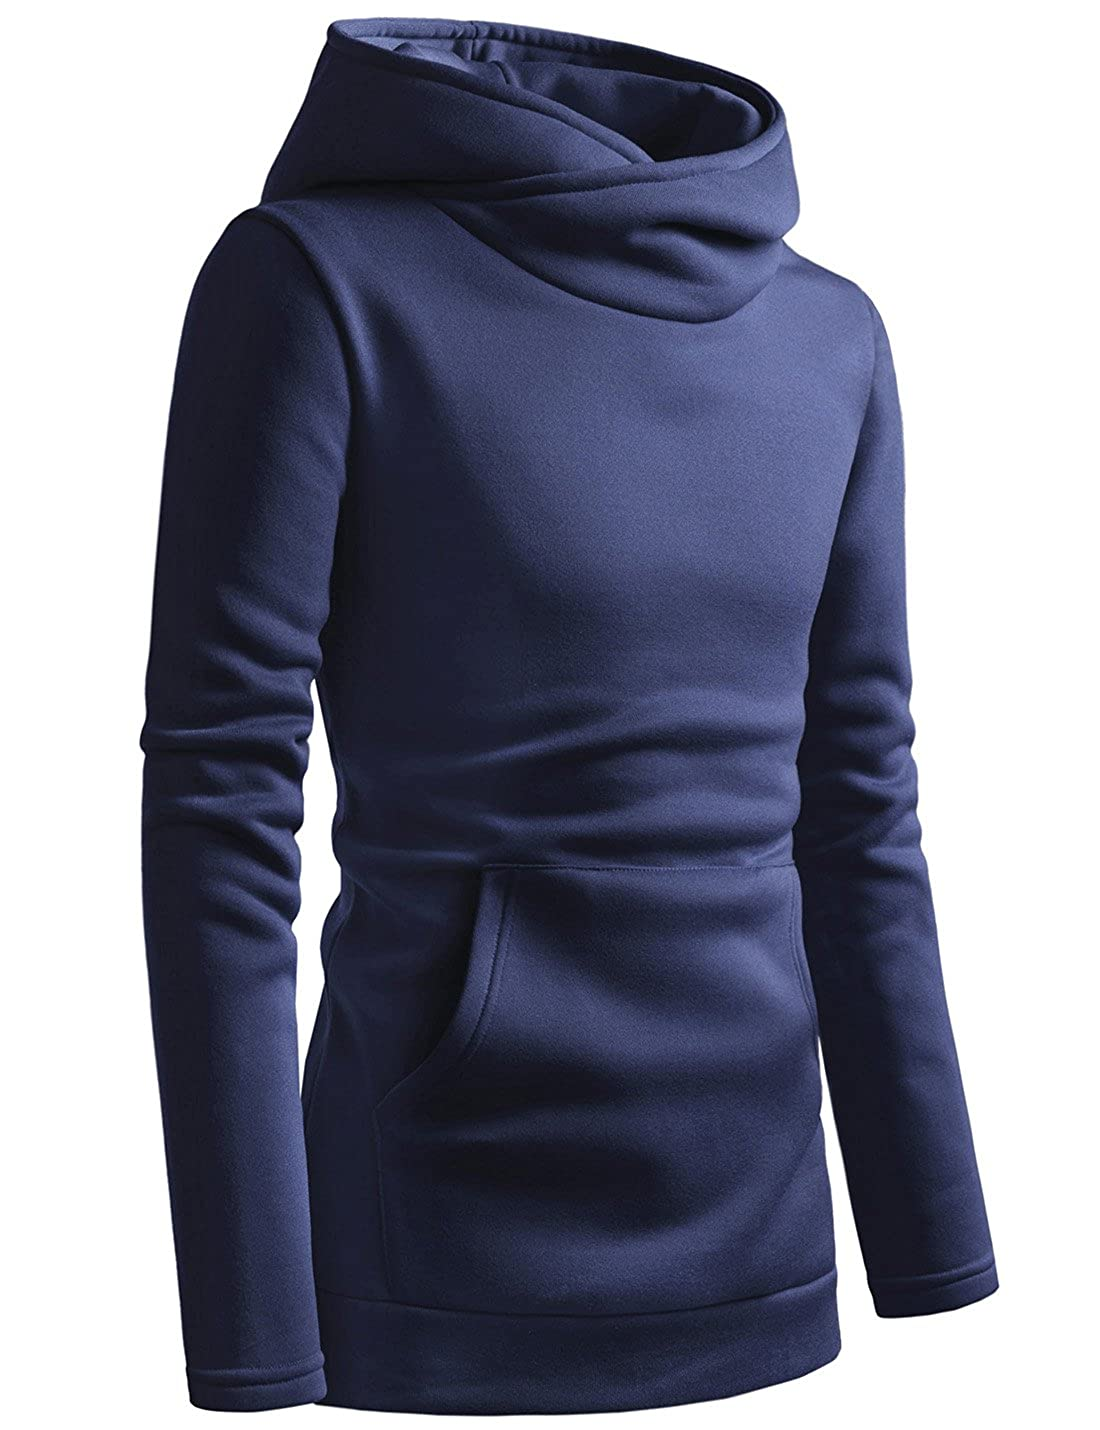 TheLees Kangaroo Pocket Pullover High neck Hoodie Fleece Sweatshirts at  Amazon Men's Clothing store: